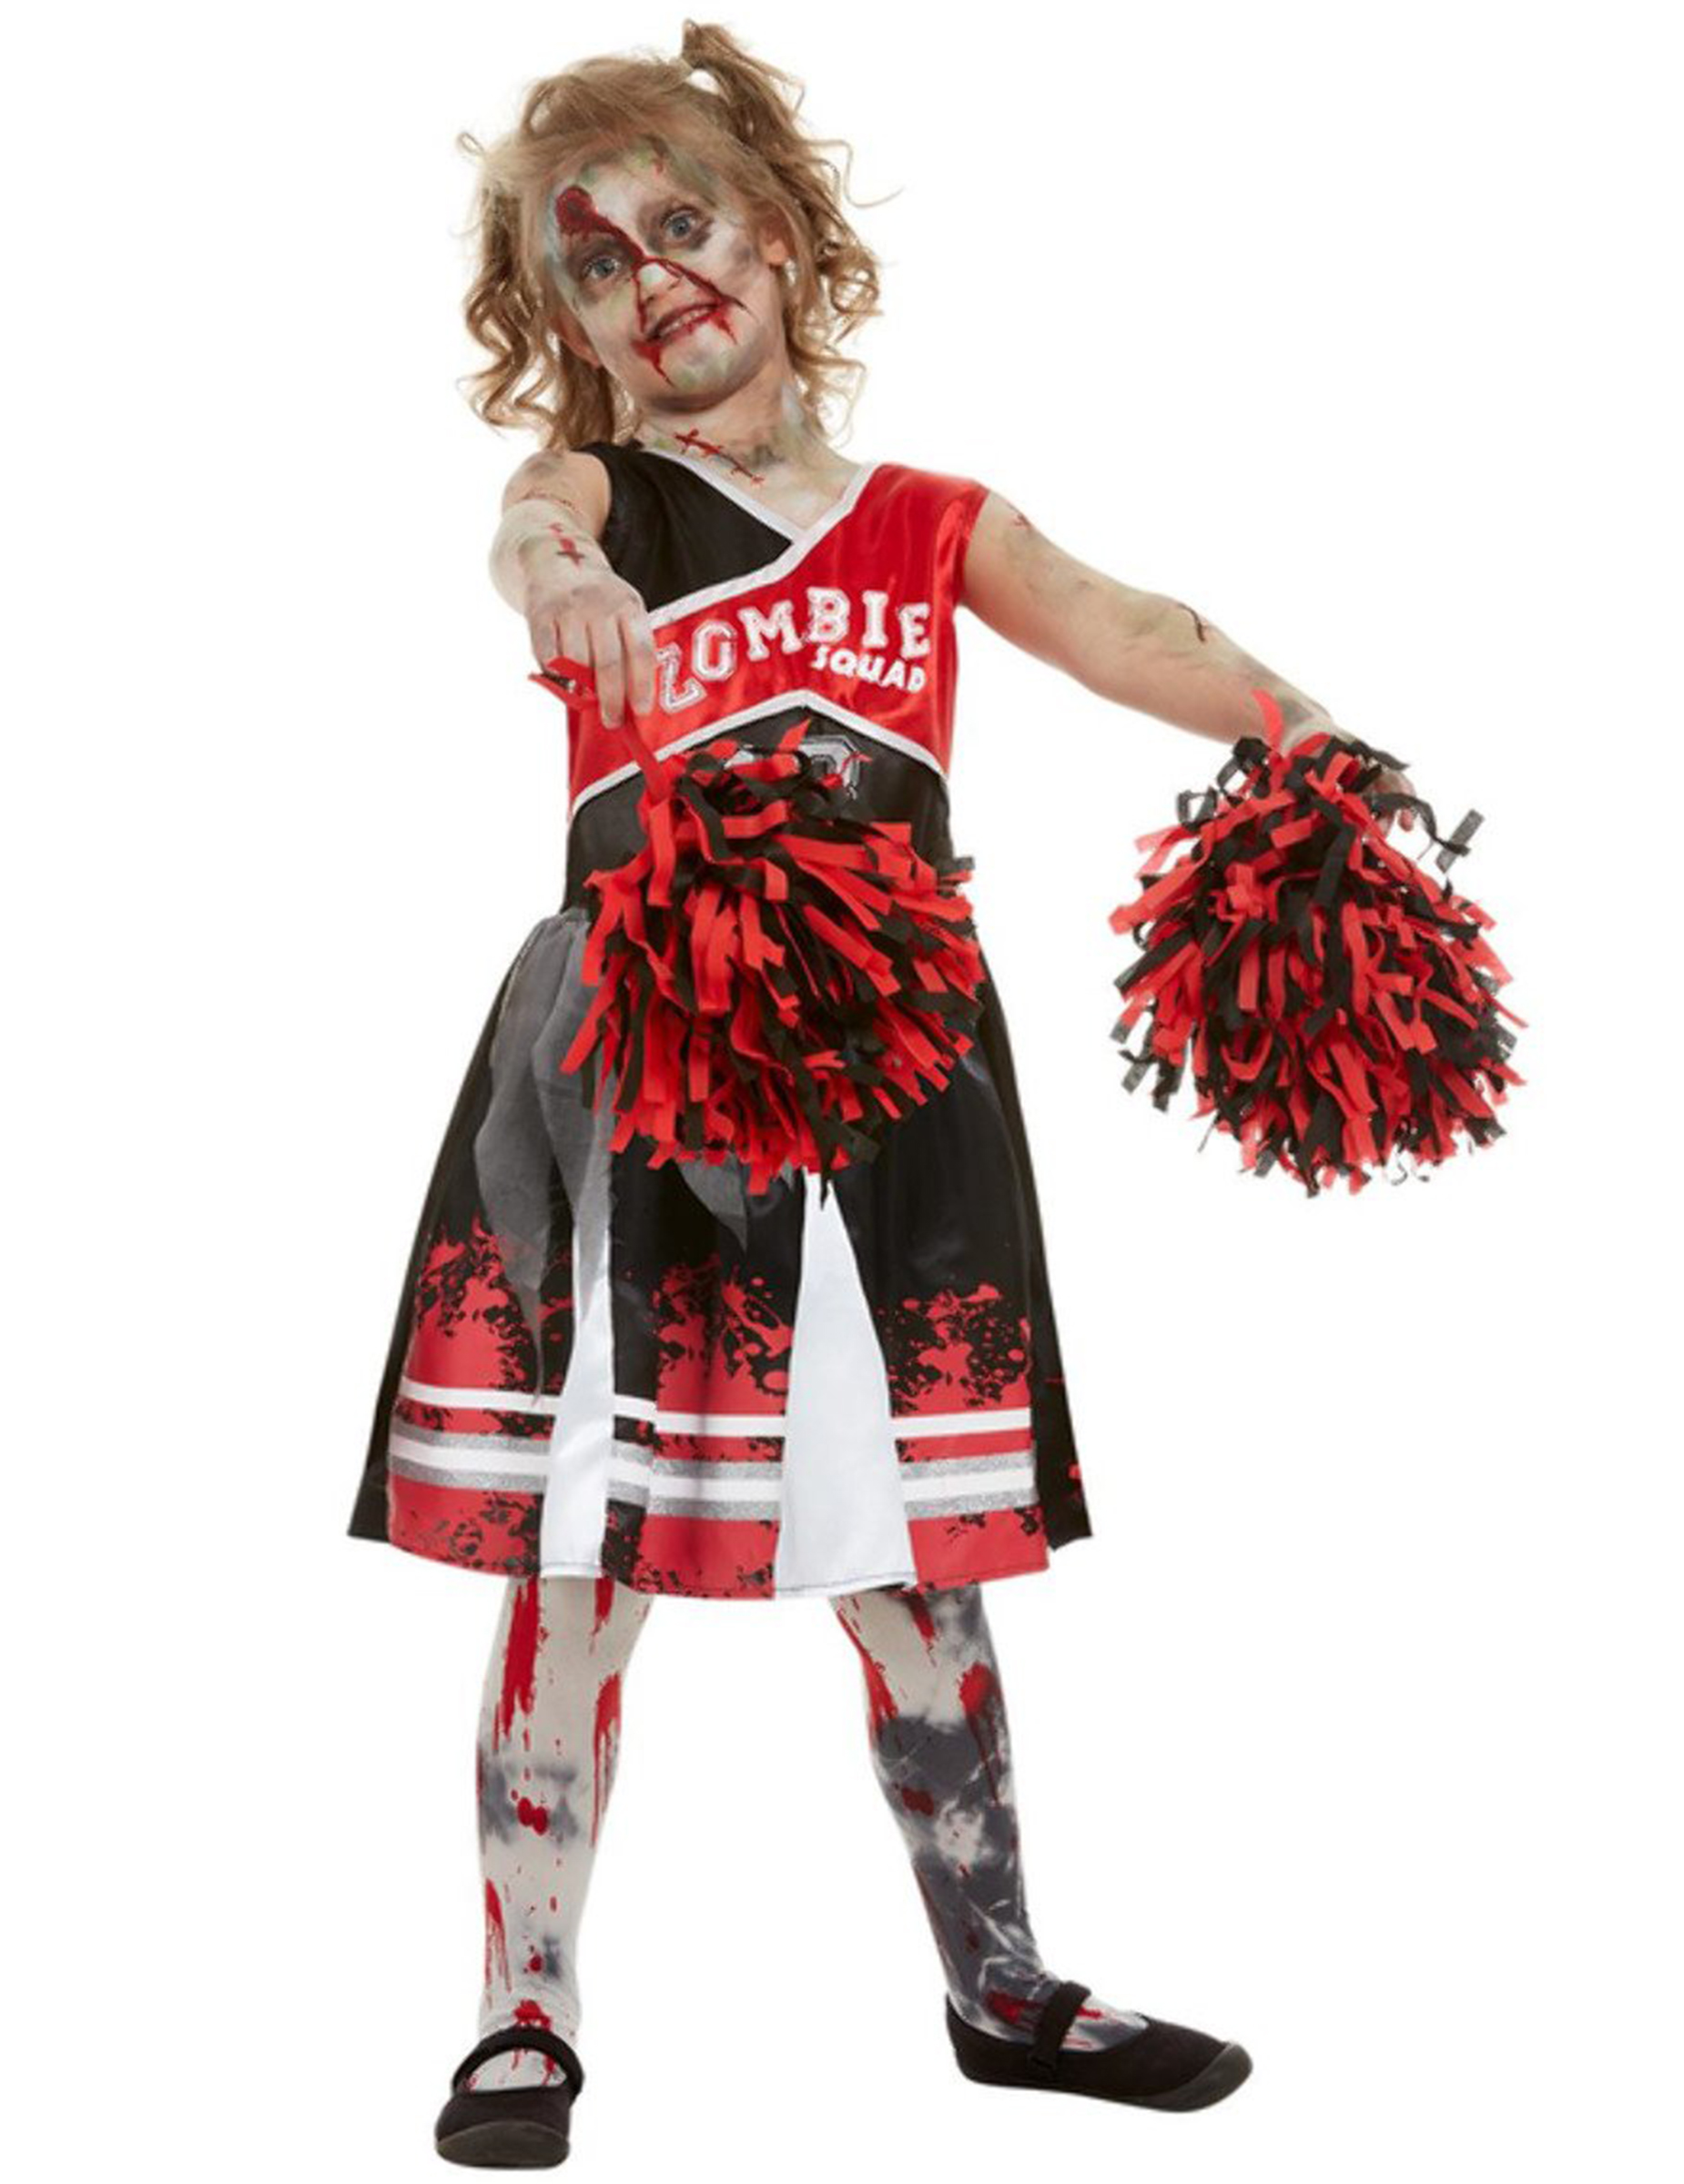 S 116 4-6 Jahre Gr Halloween Fasching Karneval Kostüm Vampir